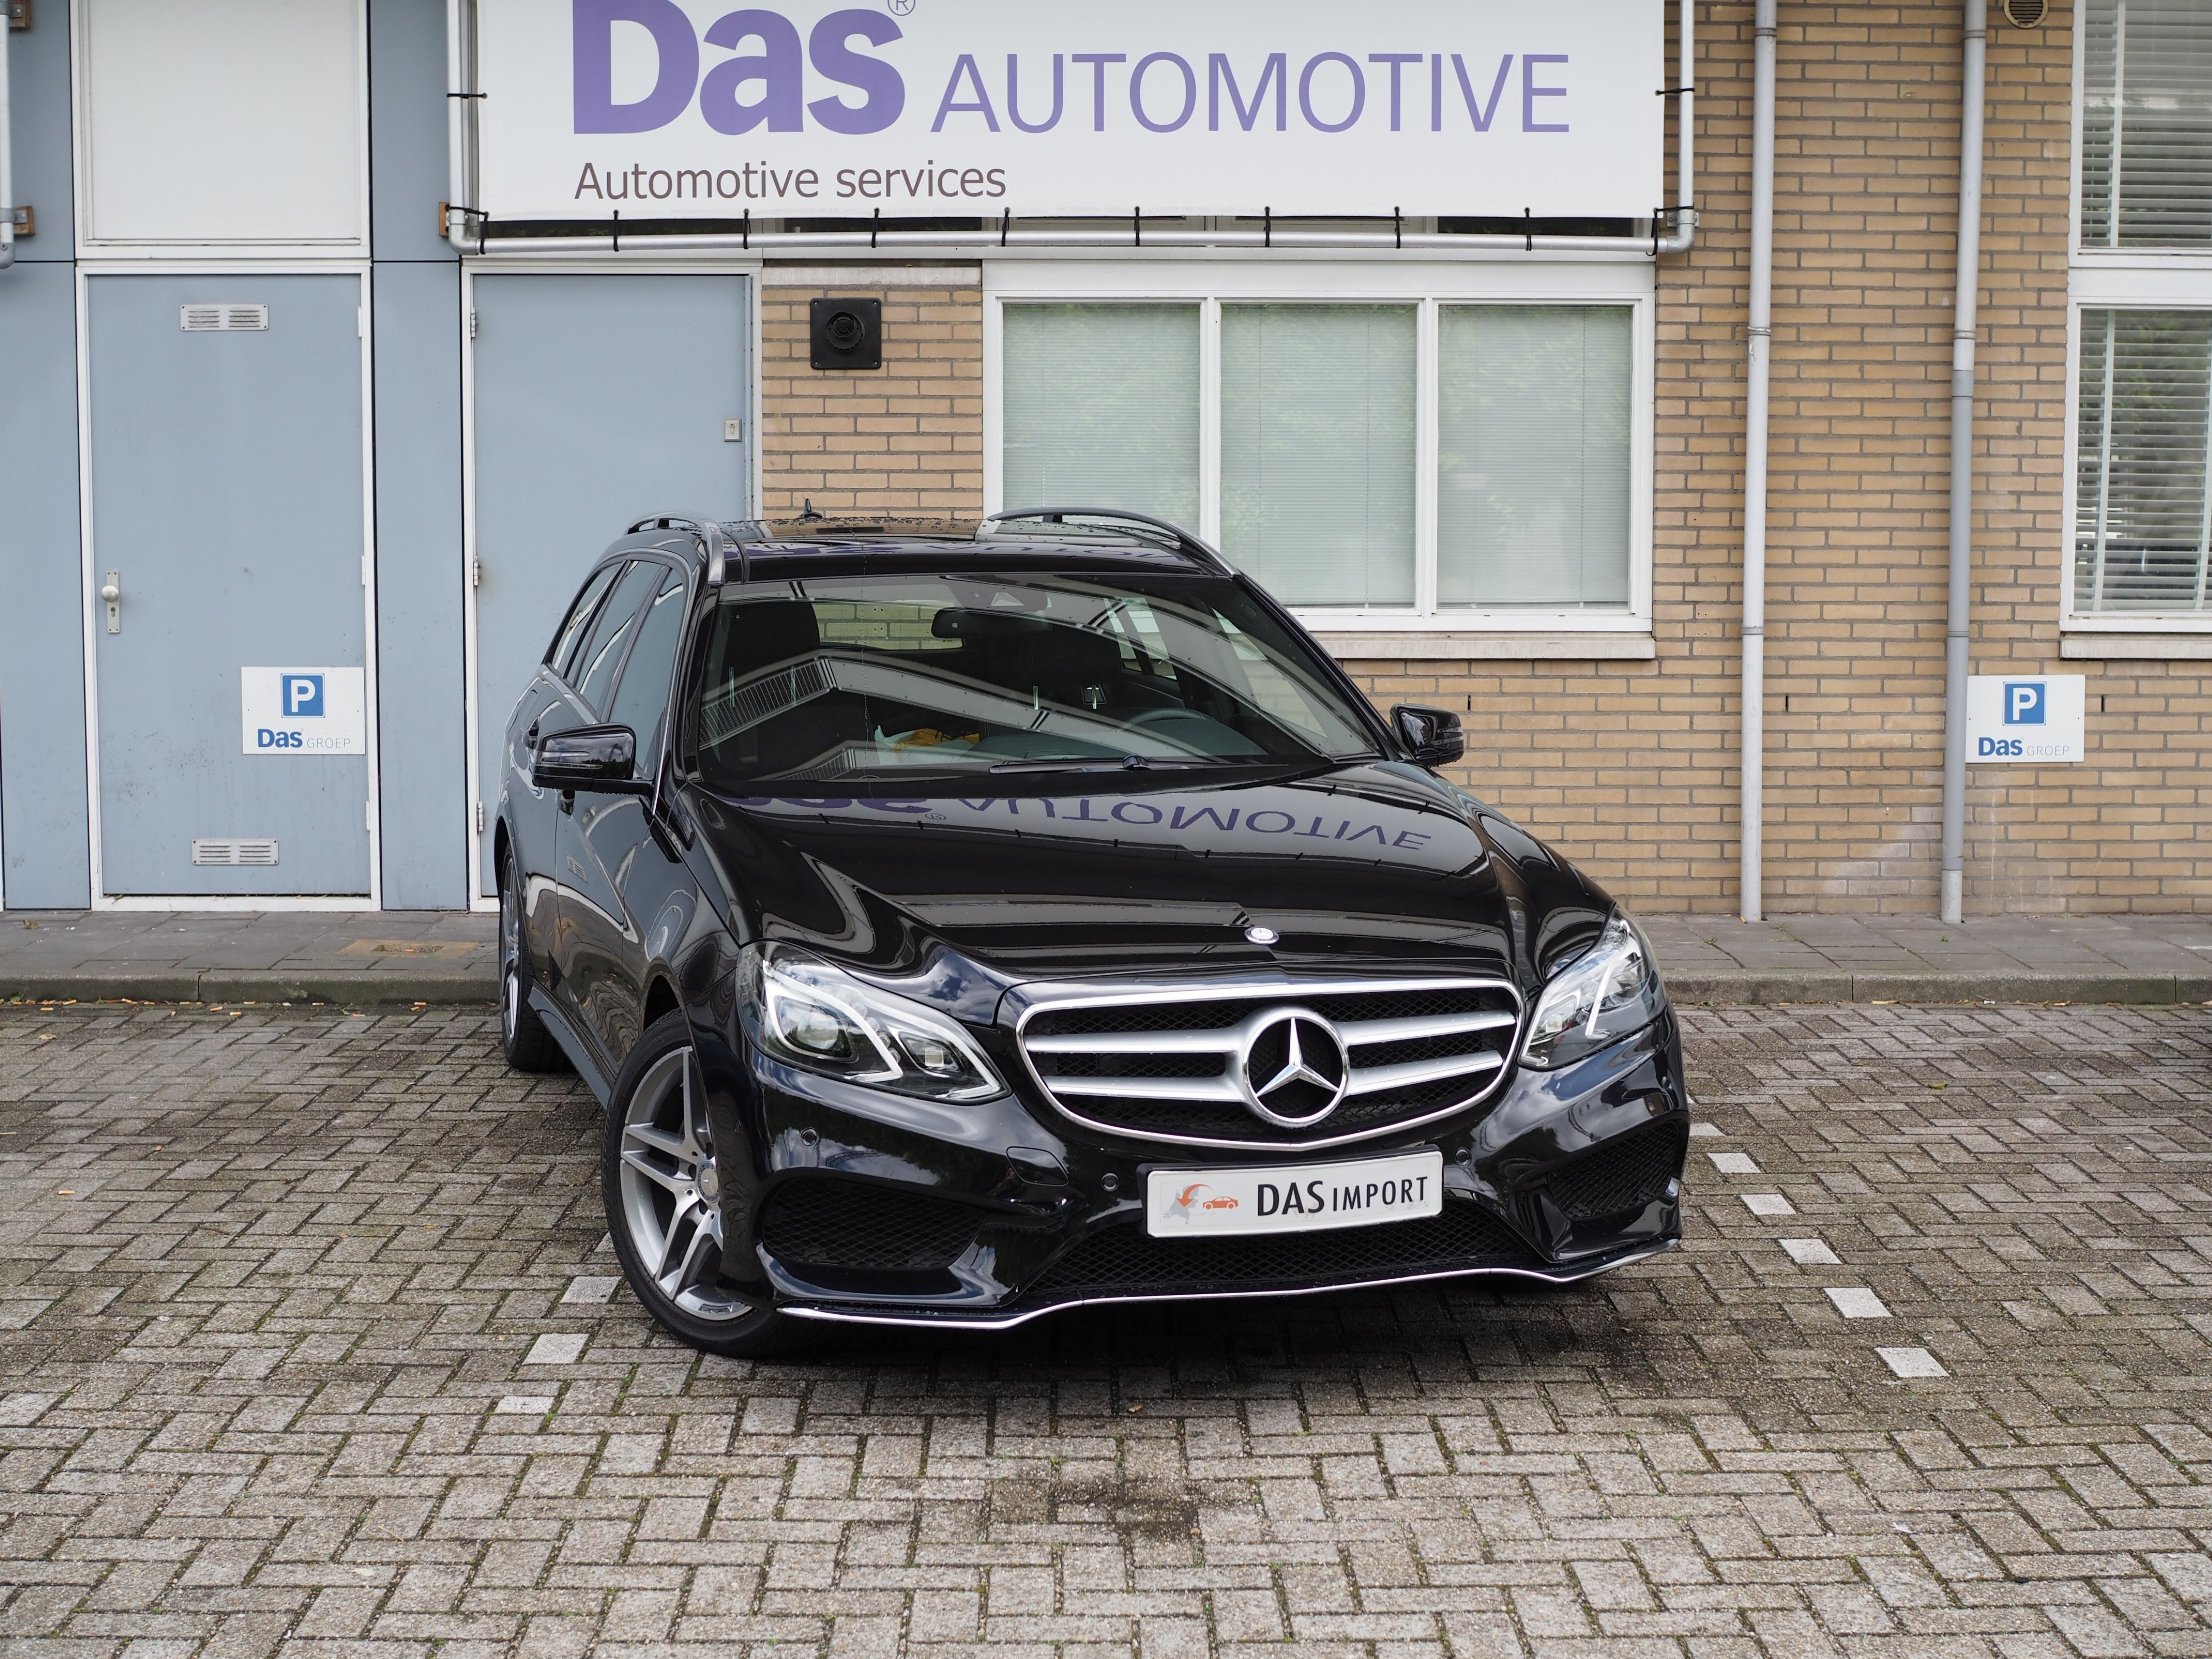 Importauto: Mercedes-Benz E-Klasse Estate Diesel E 250 CDI Aut 10/2013